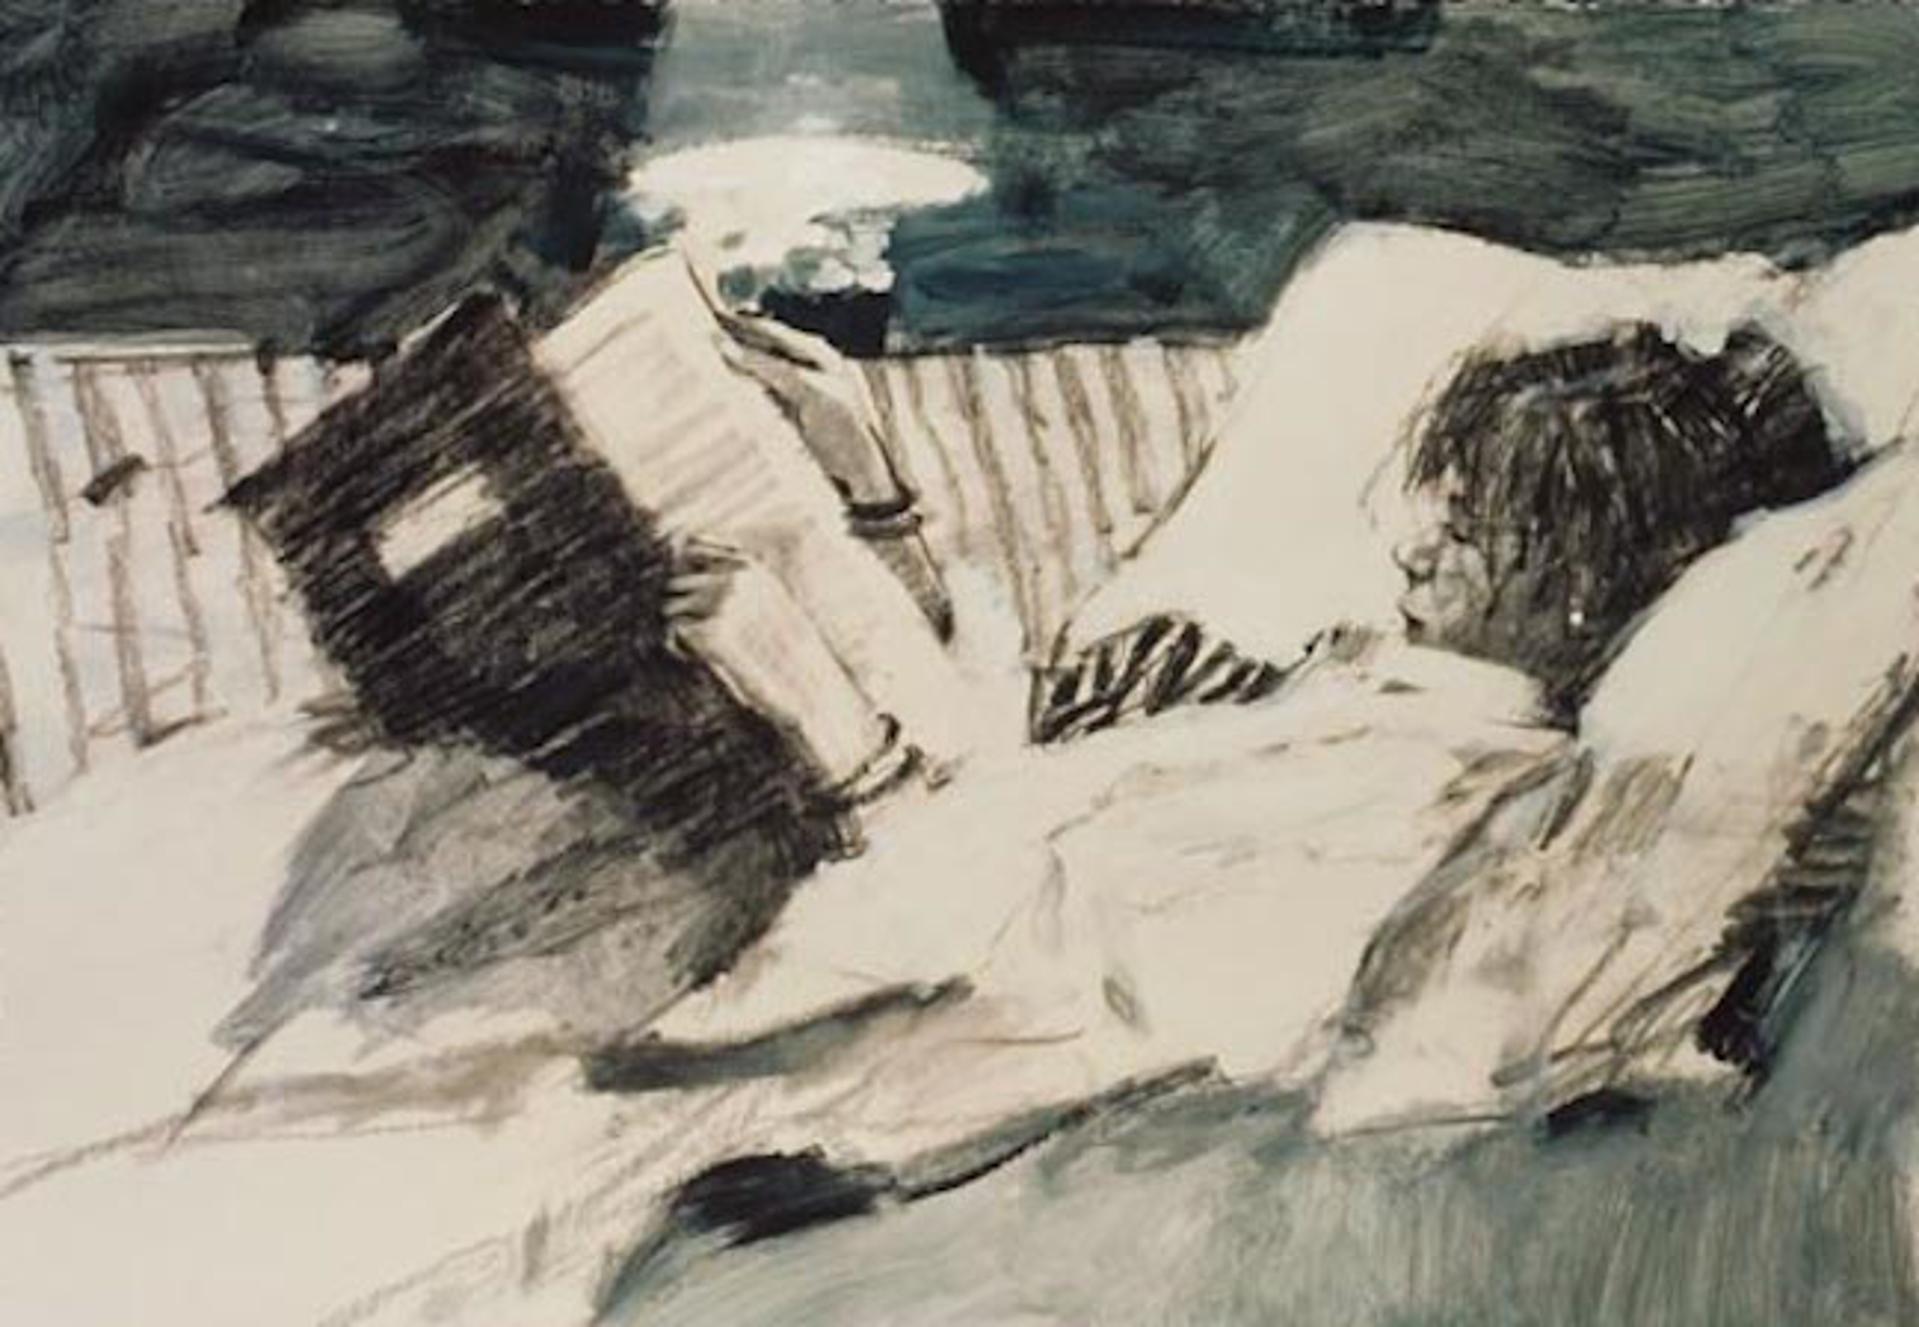 Bedtime Stories (B&W) by Aldo Luongo